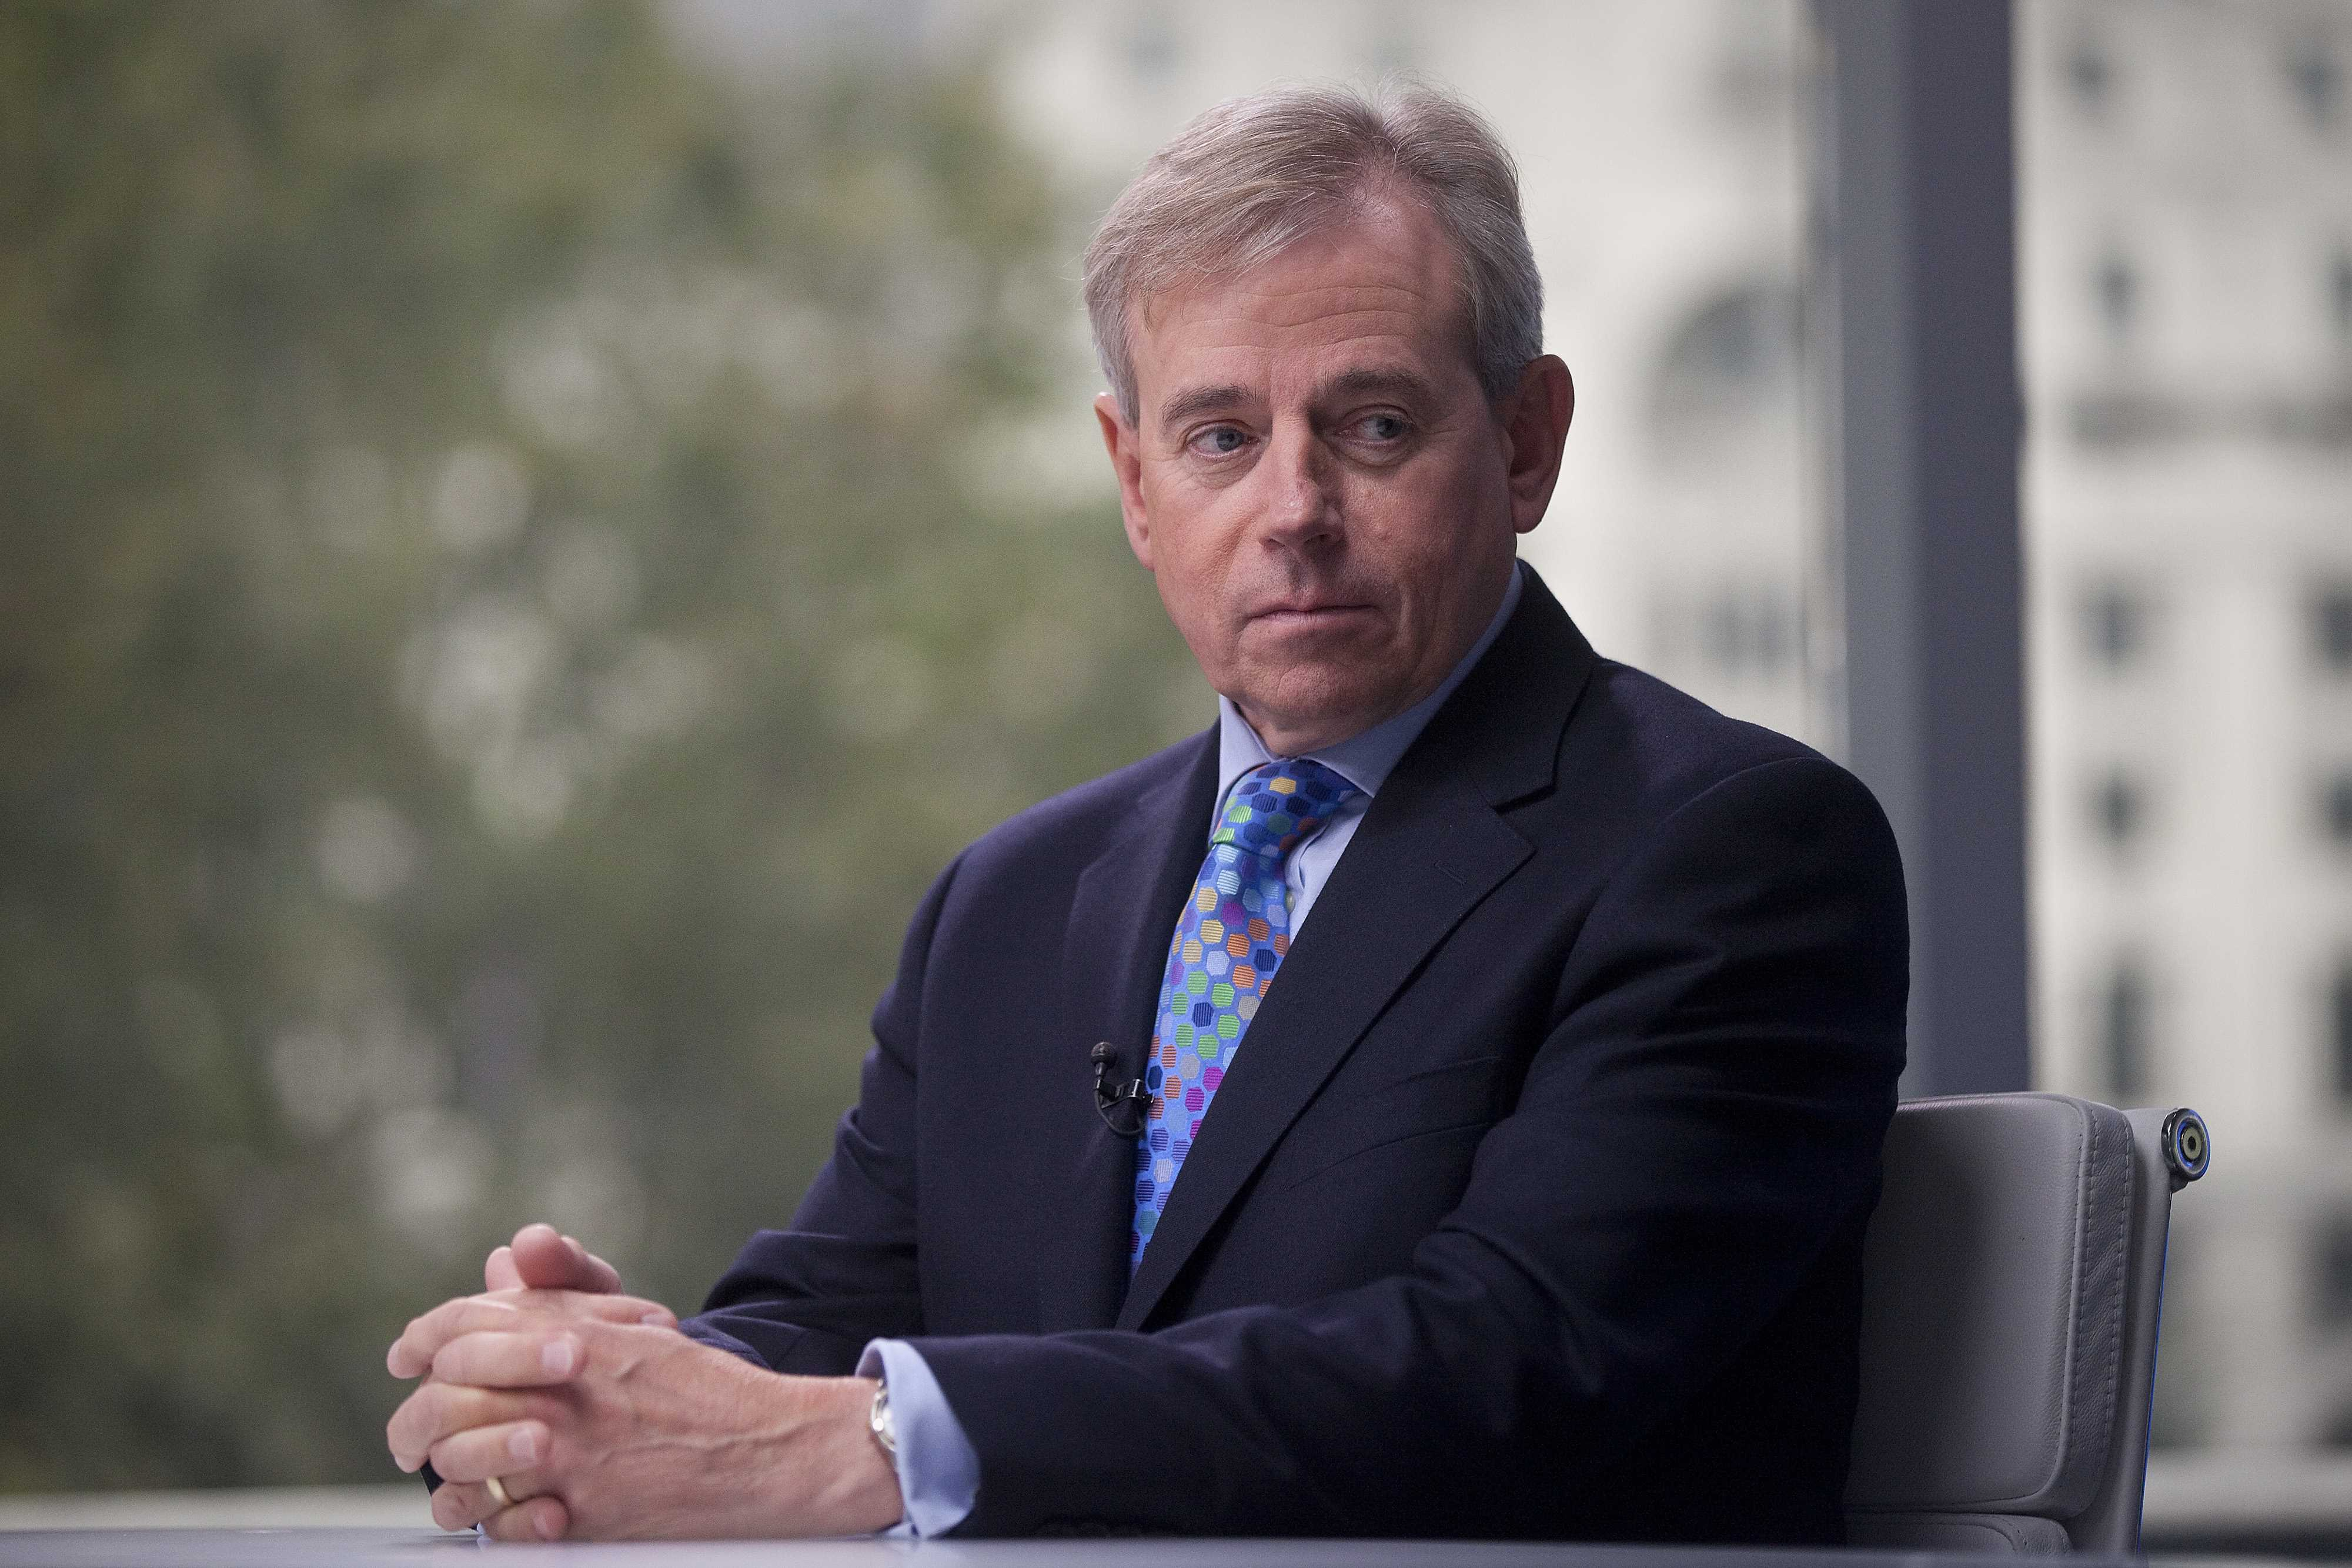 Former Lloyd's CEO Richard Ward joins Cunningham Lindsey